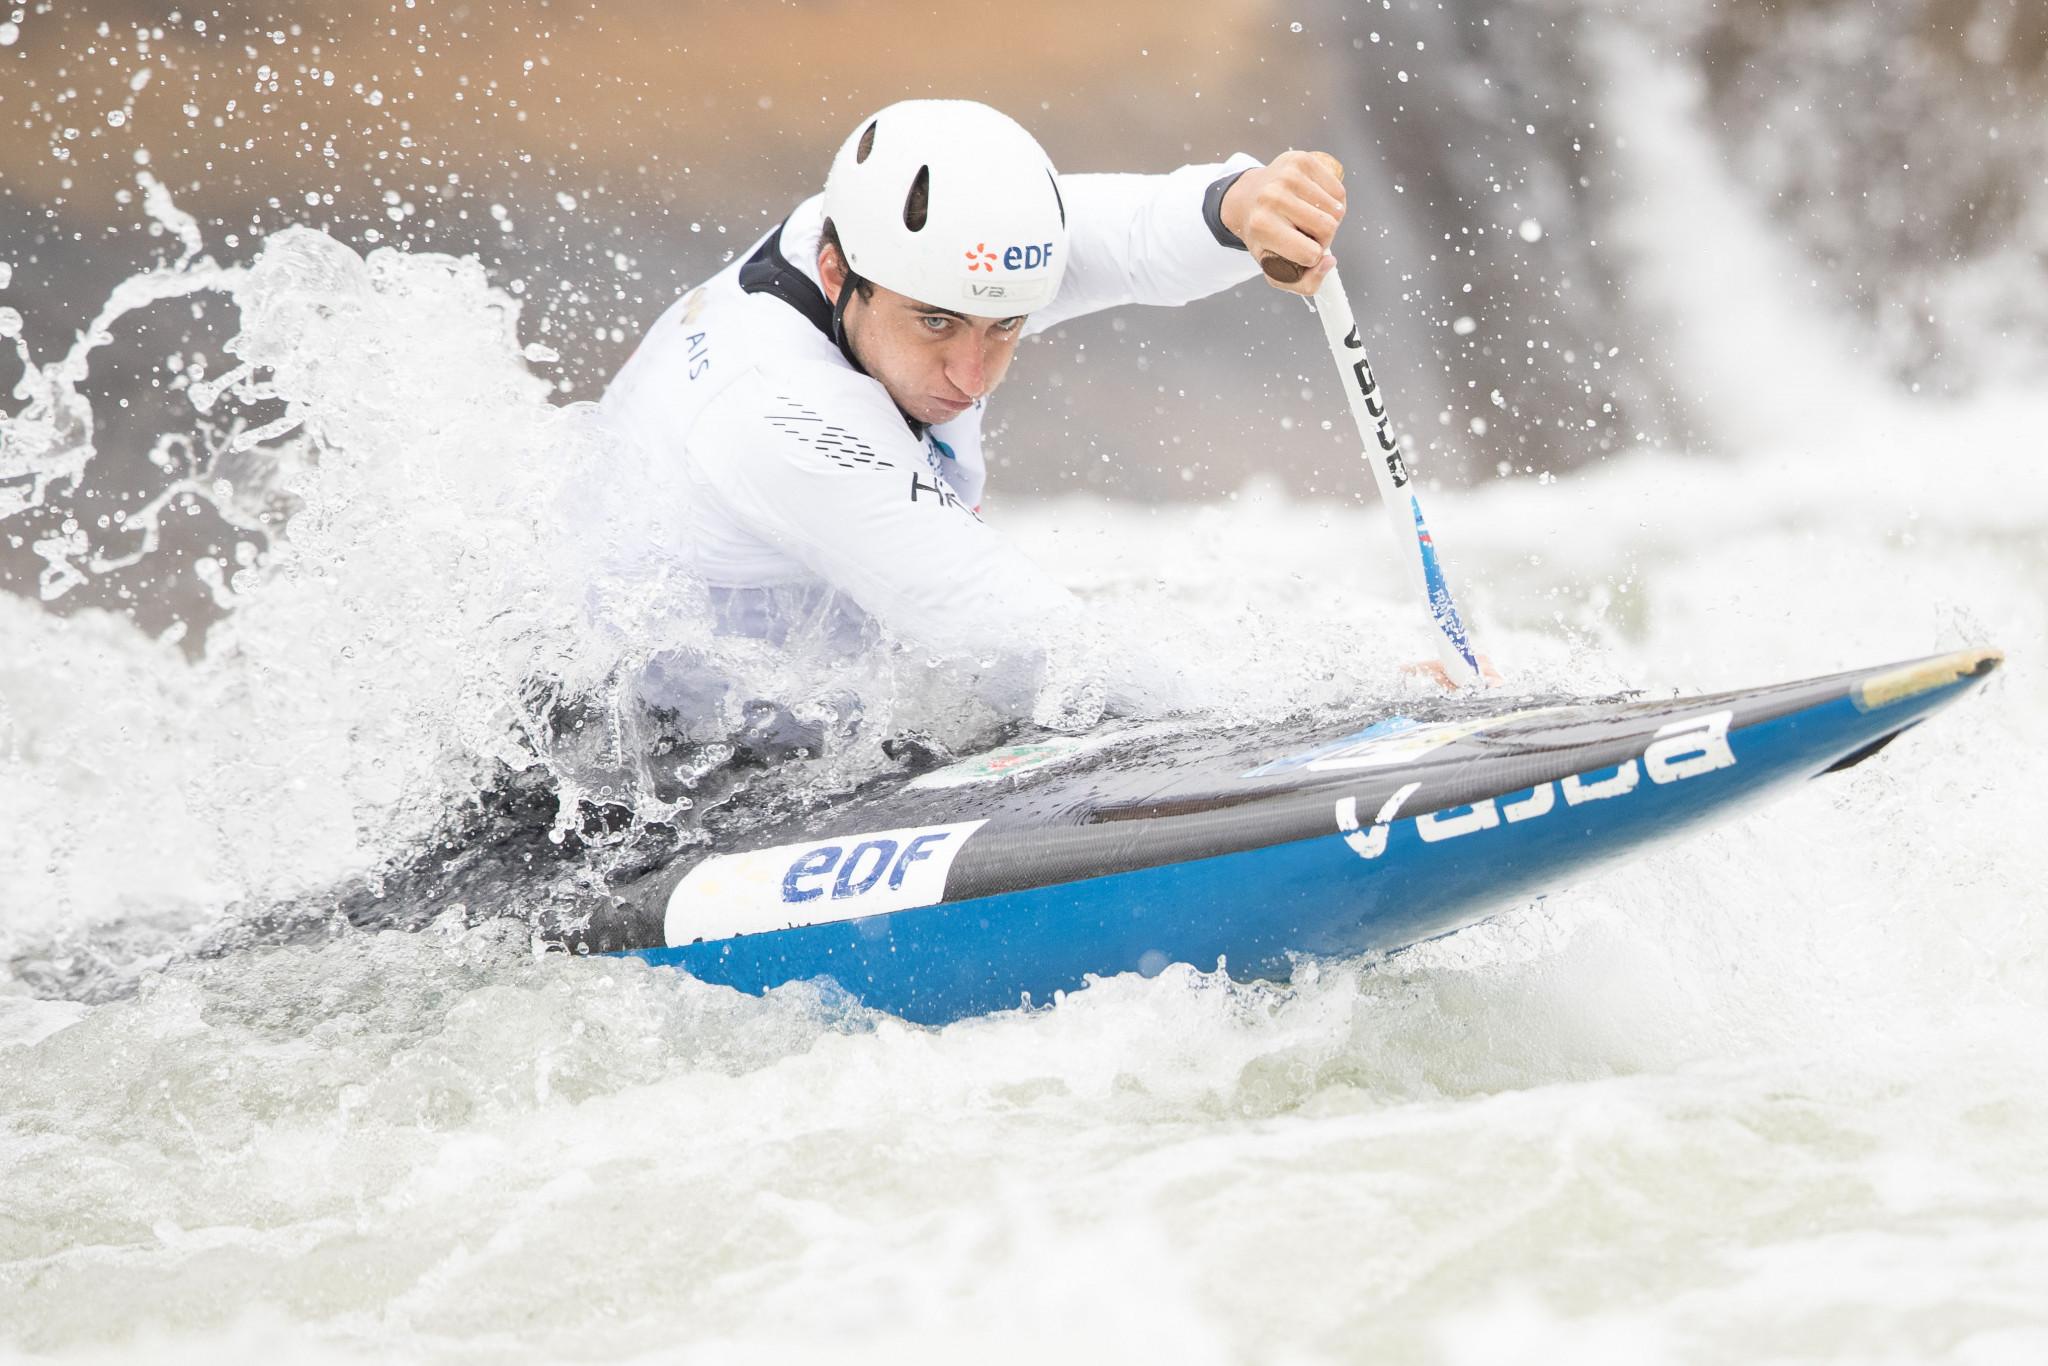 Markkleeberg set to host second event of ICF Canoe Slalom World Cup season